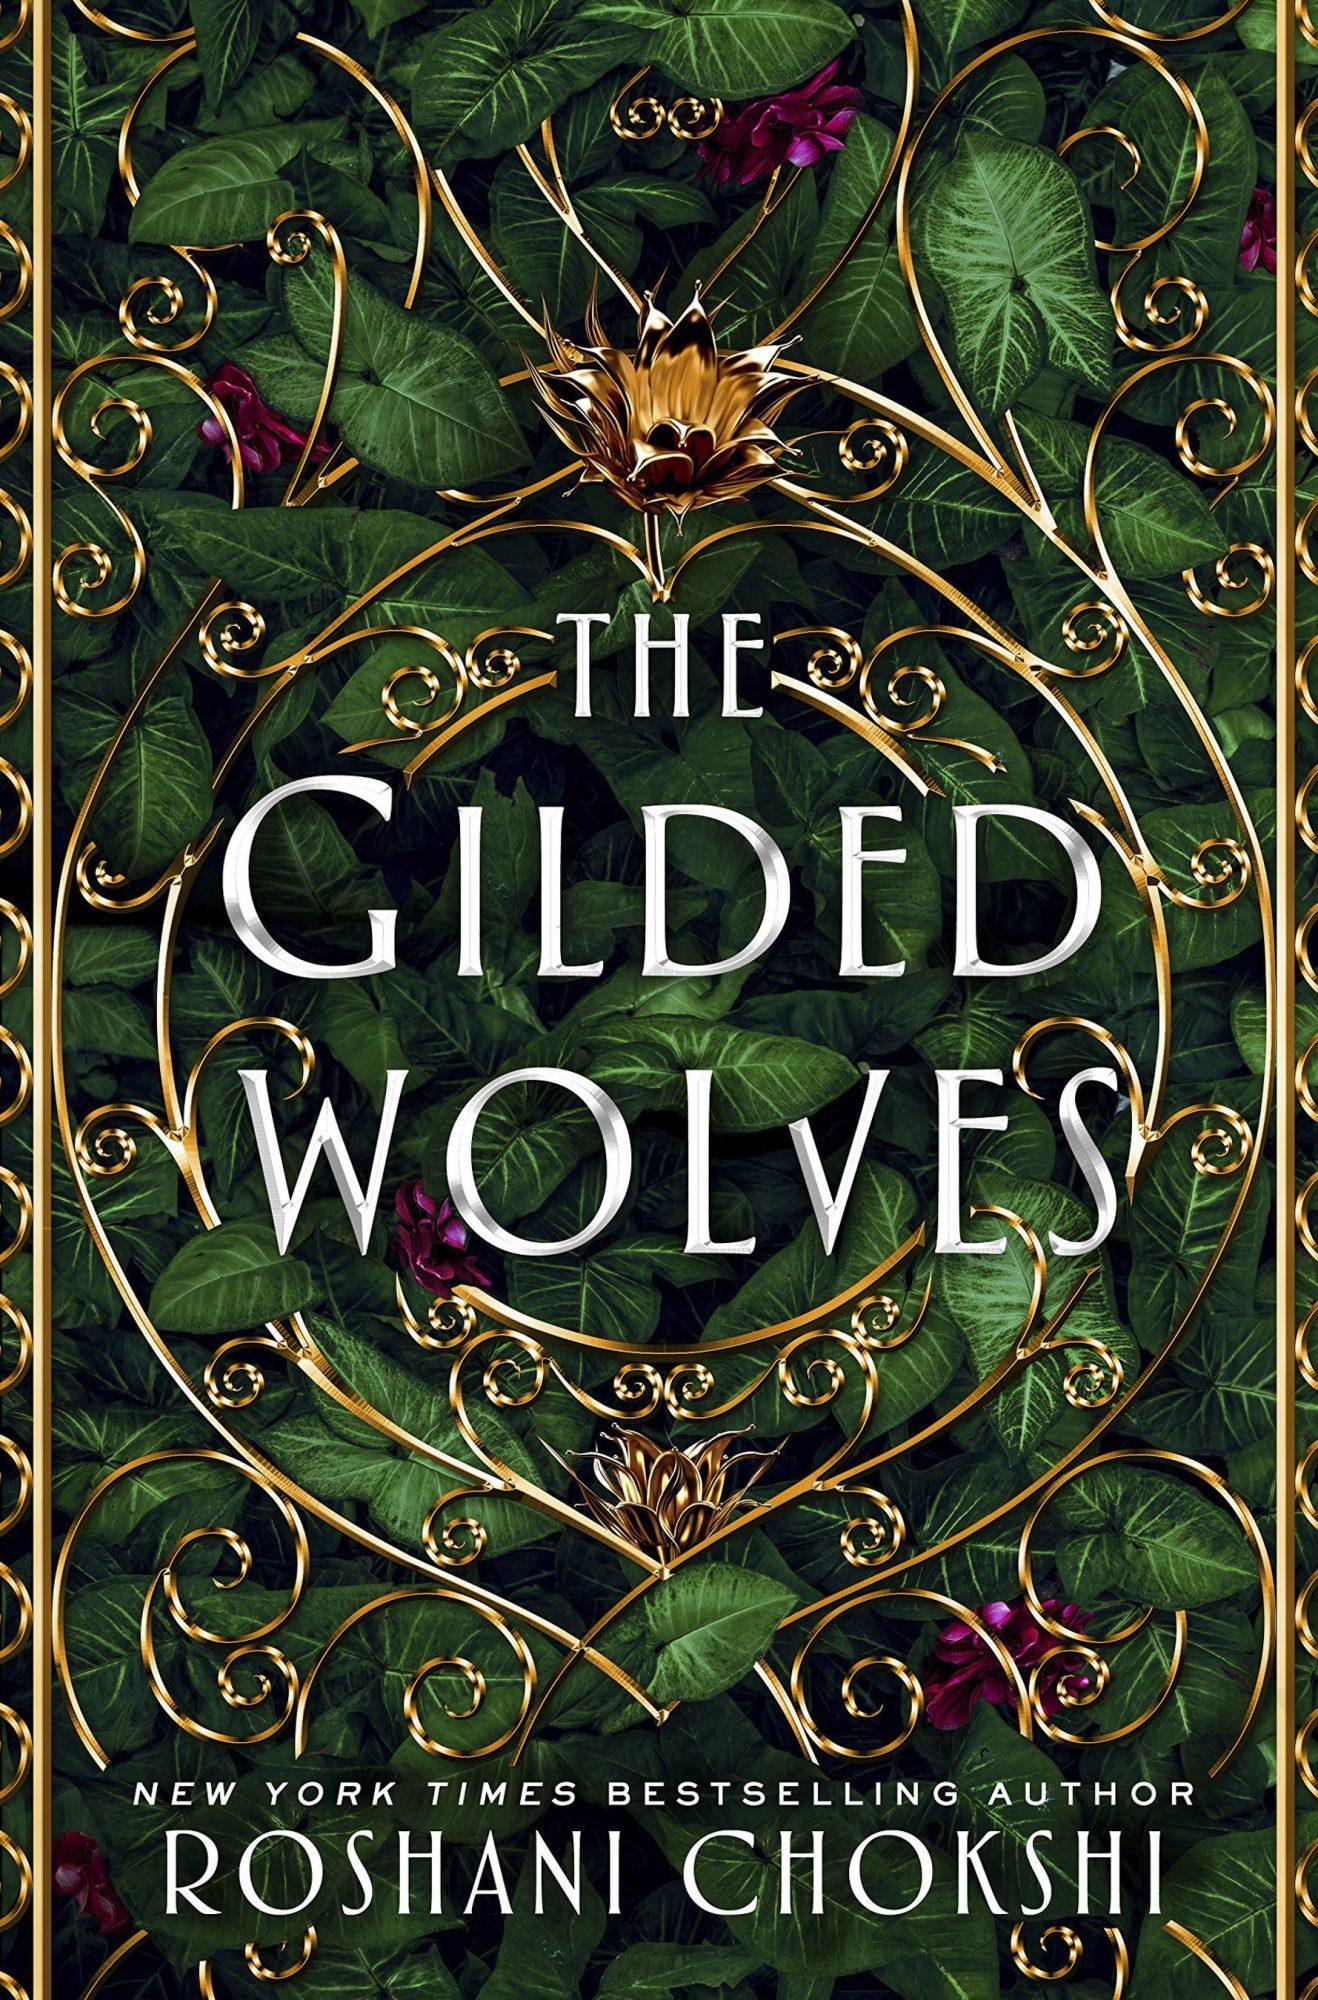 The Gilded Wolves by Roshani Chokshi CR: Wednesday Books